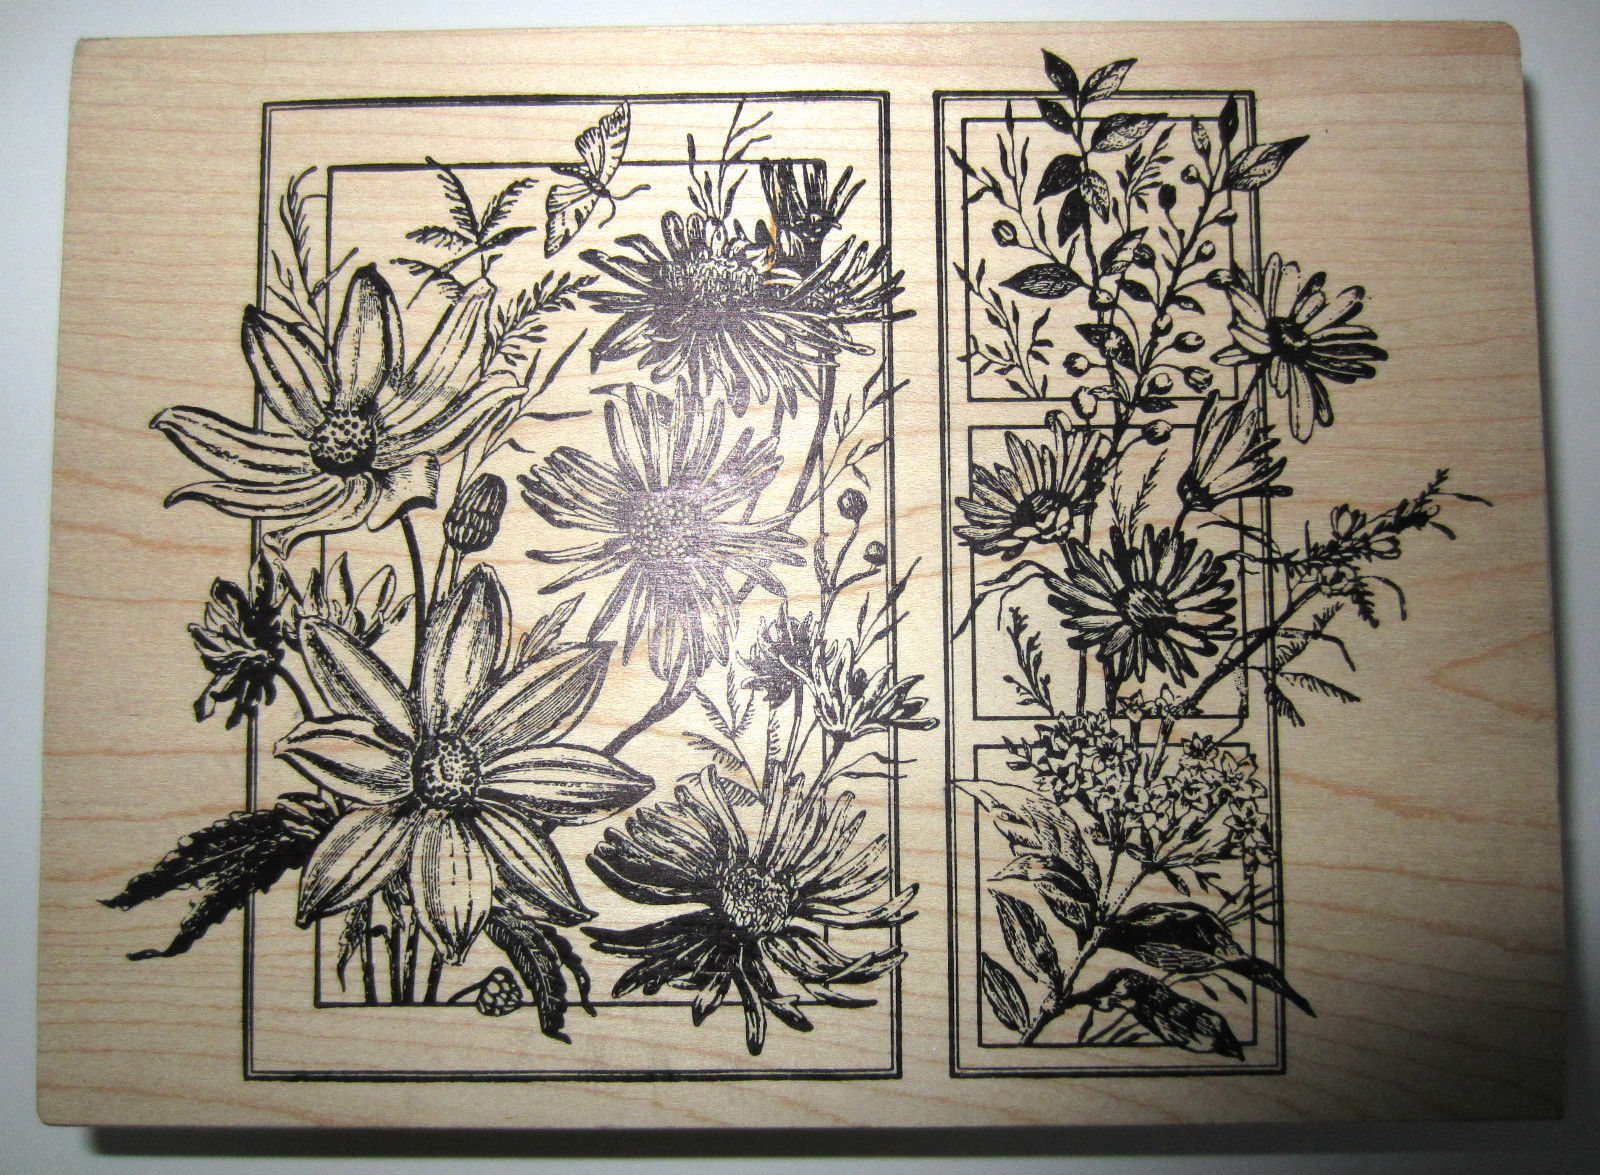 Magenta Wildflowers In Bloom Botanical Garden Wooden